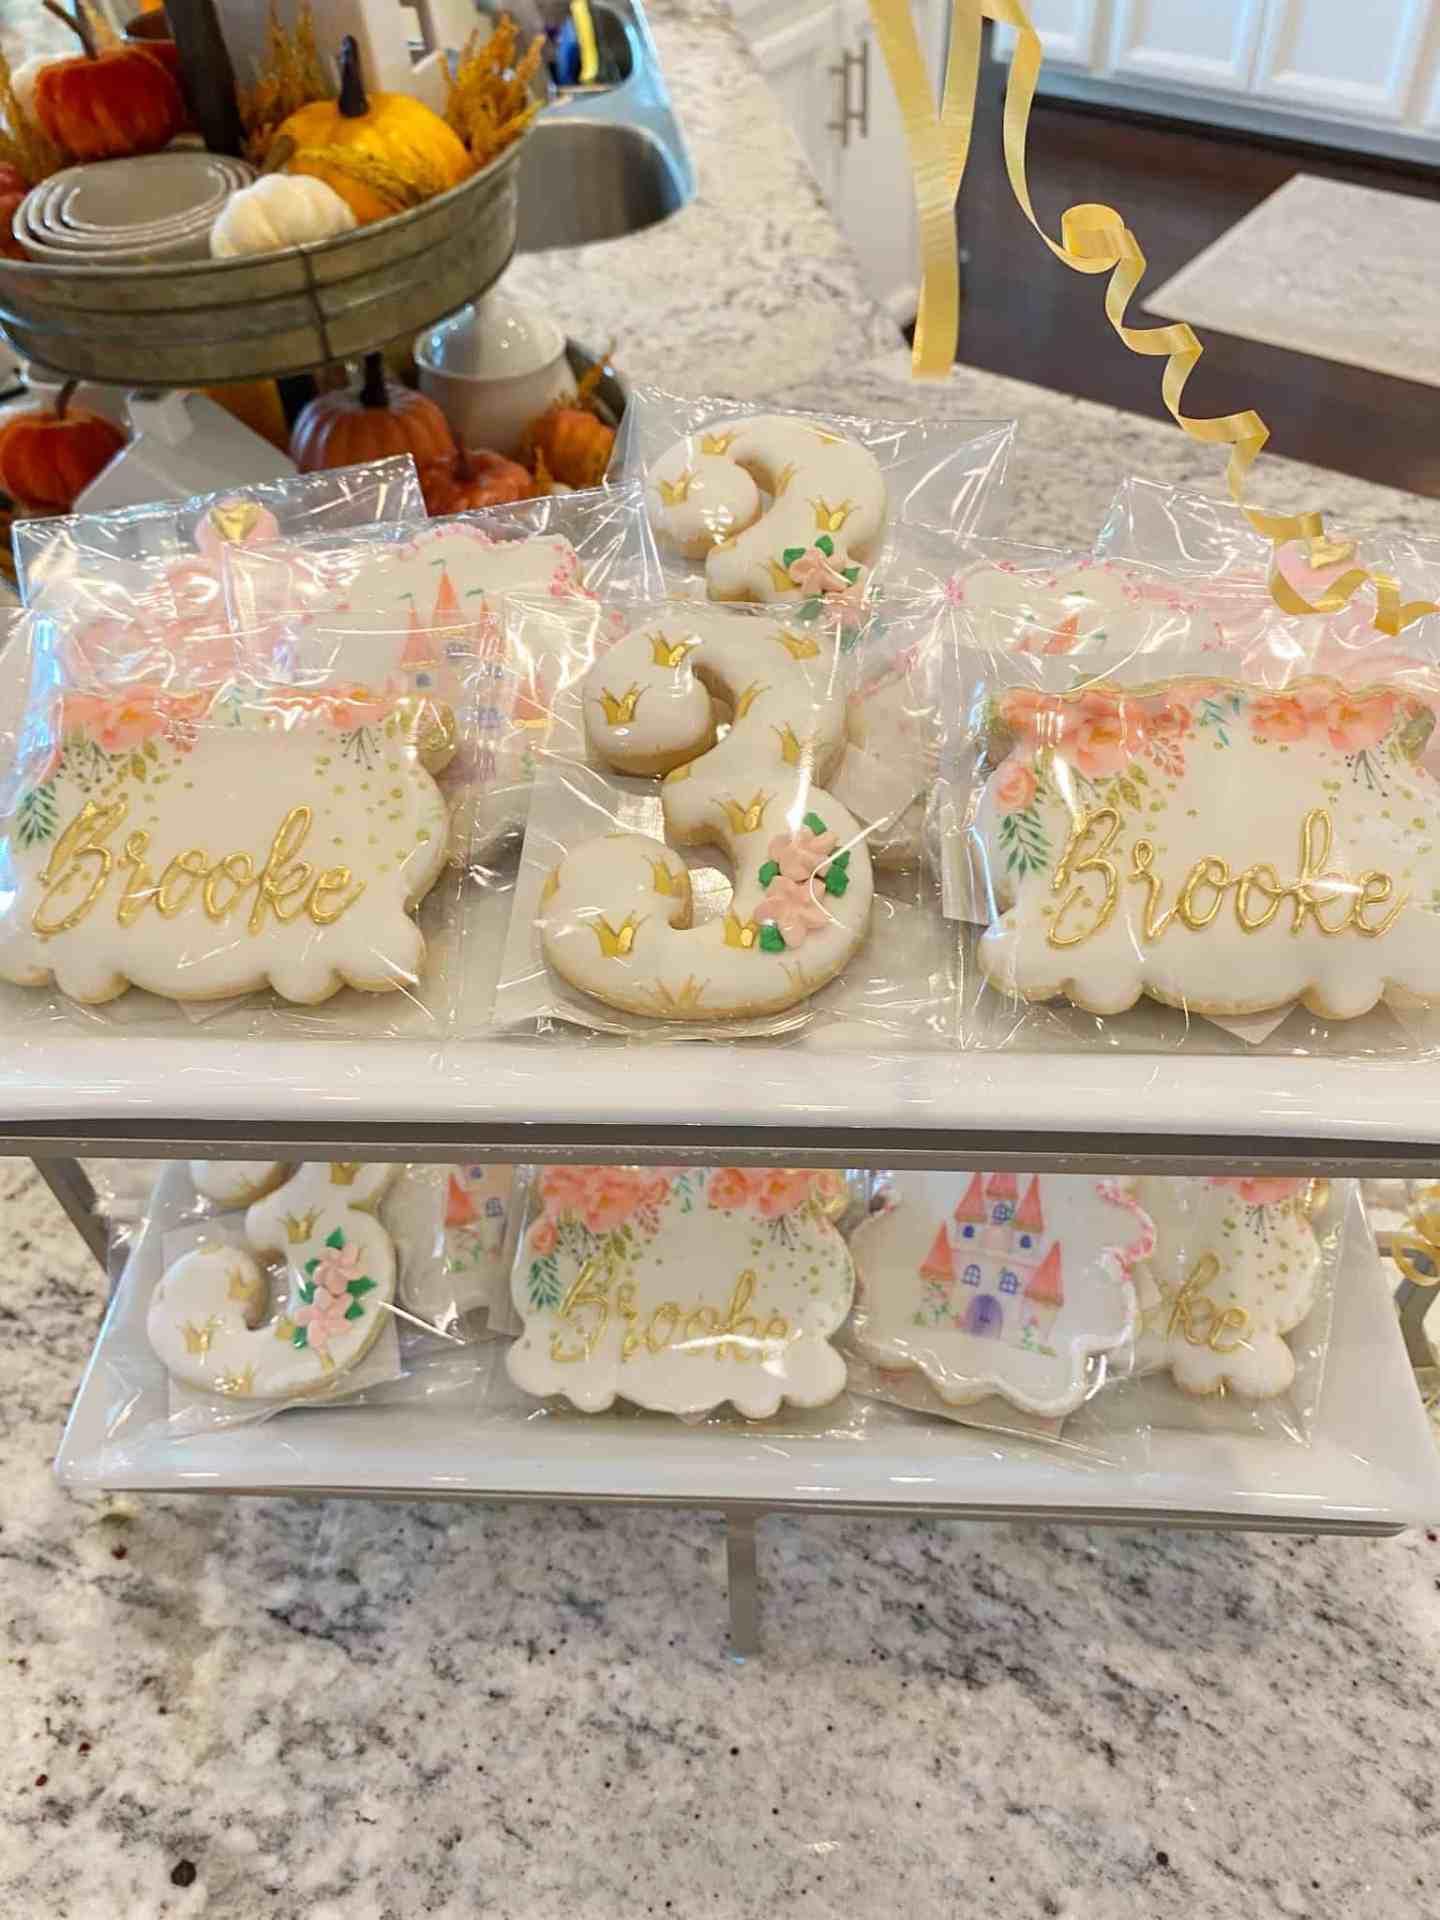 underground confection bakery cypress